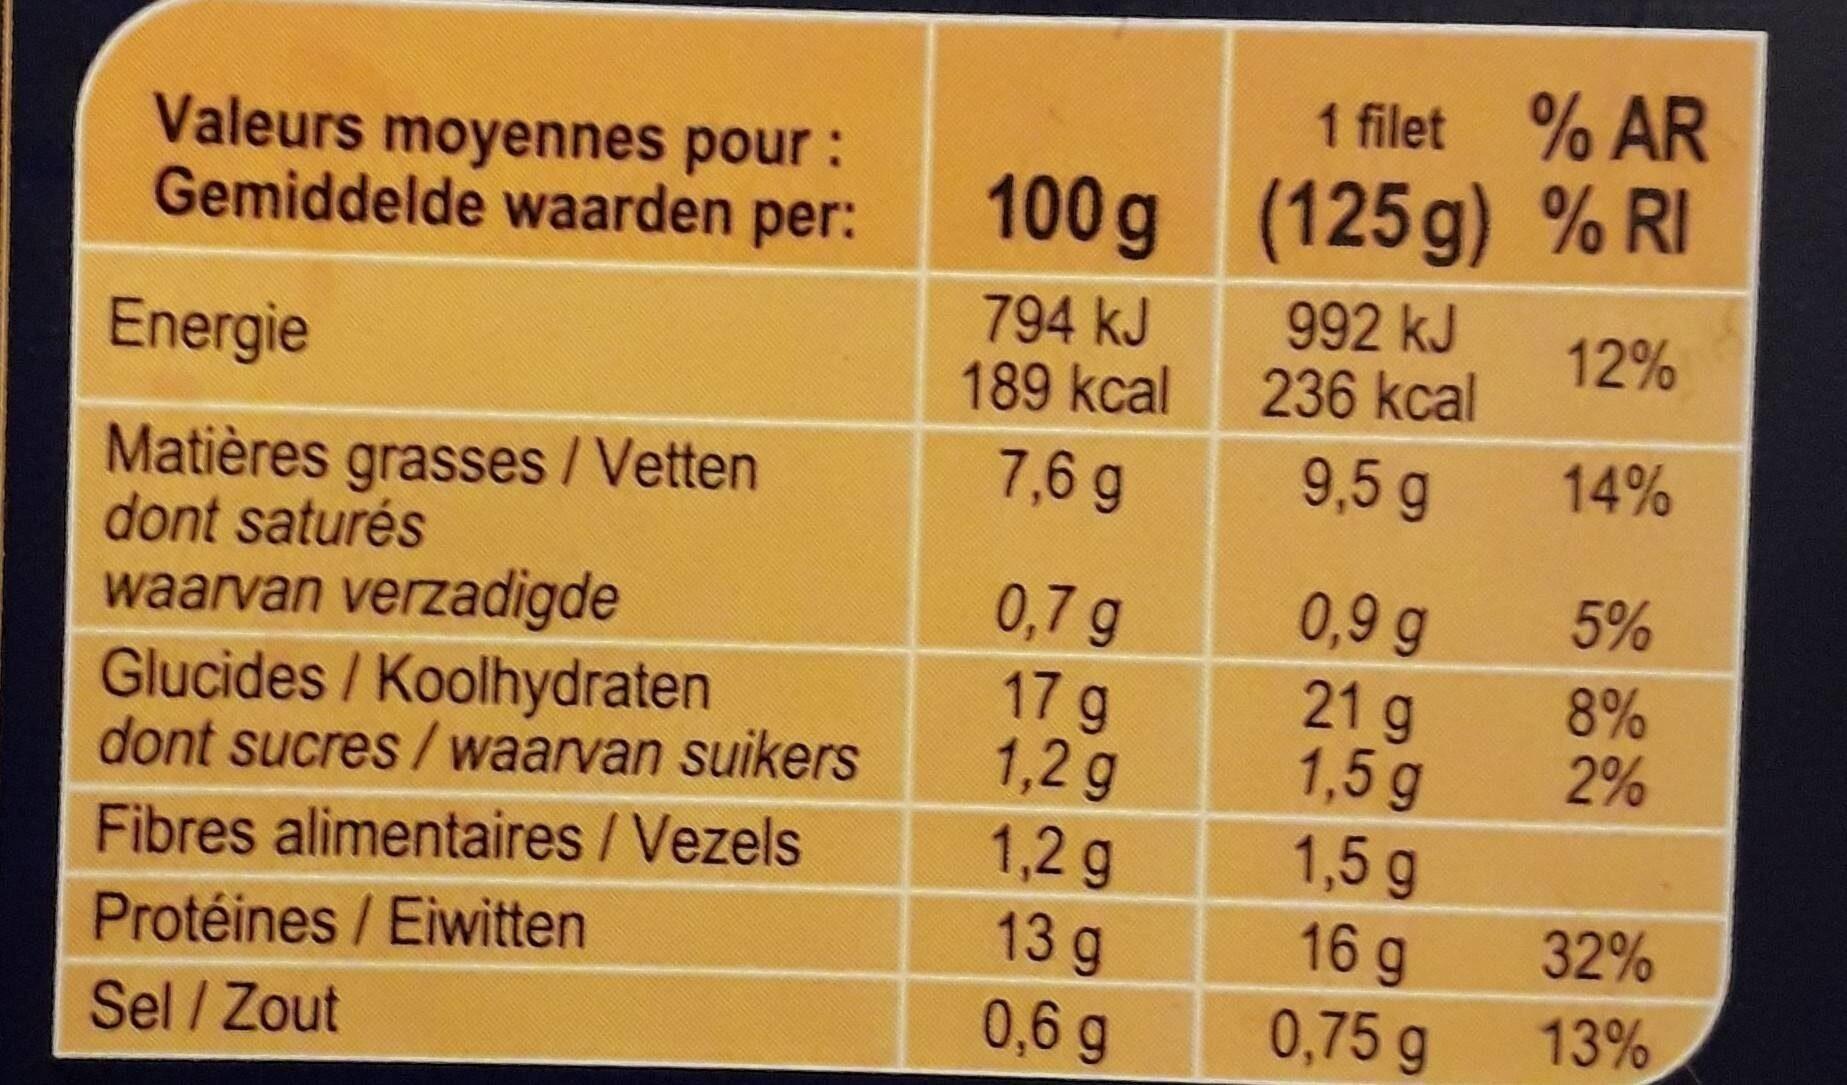 Filet de Cabillaud Pané - Voedingswaarden - fr